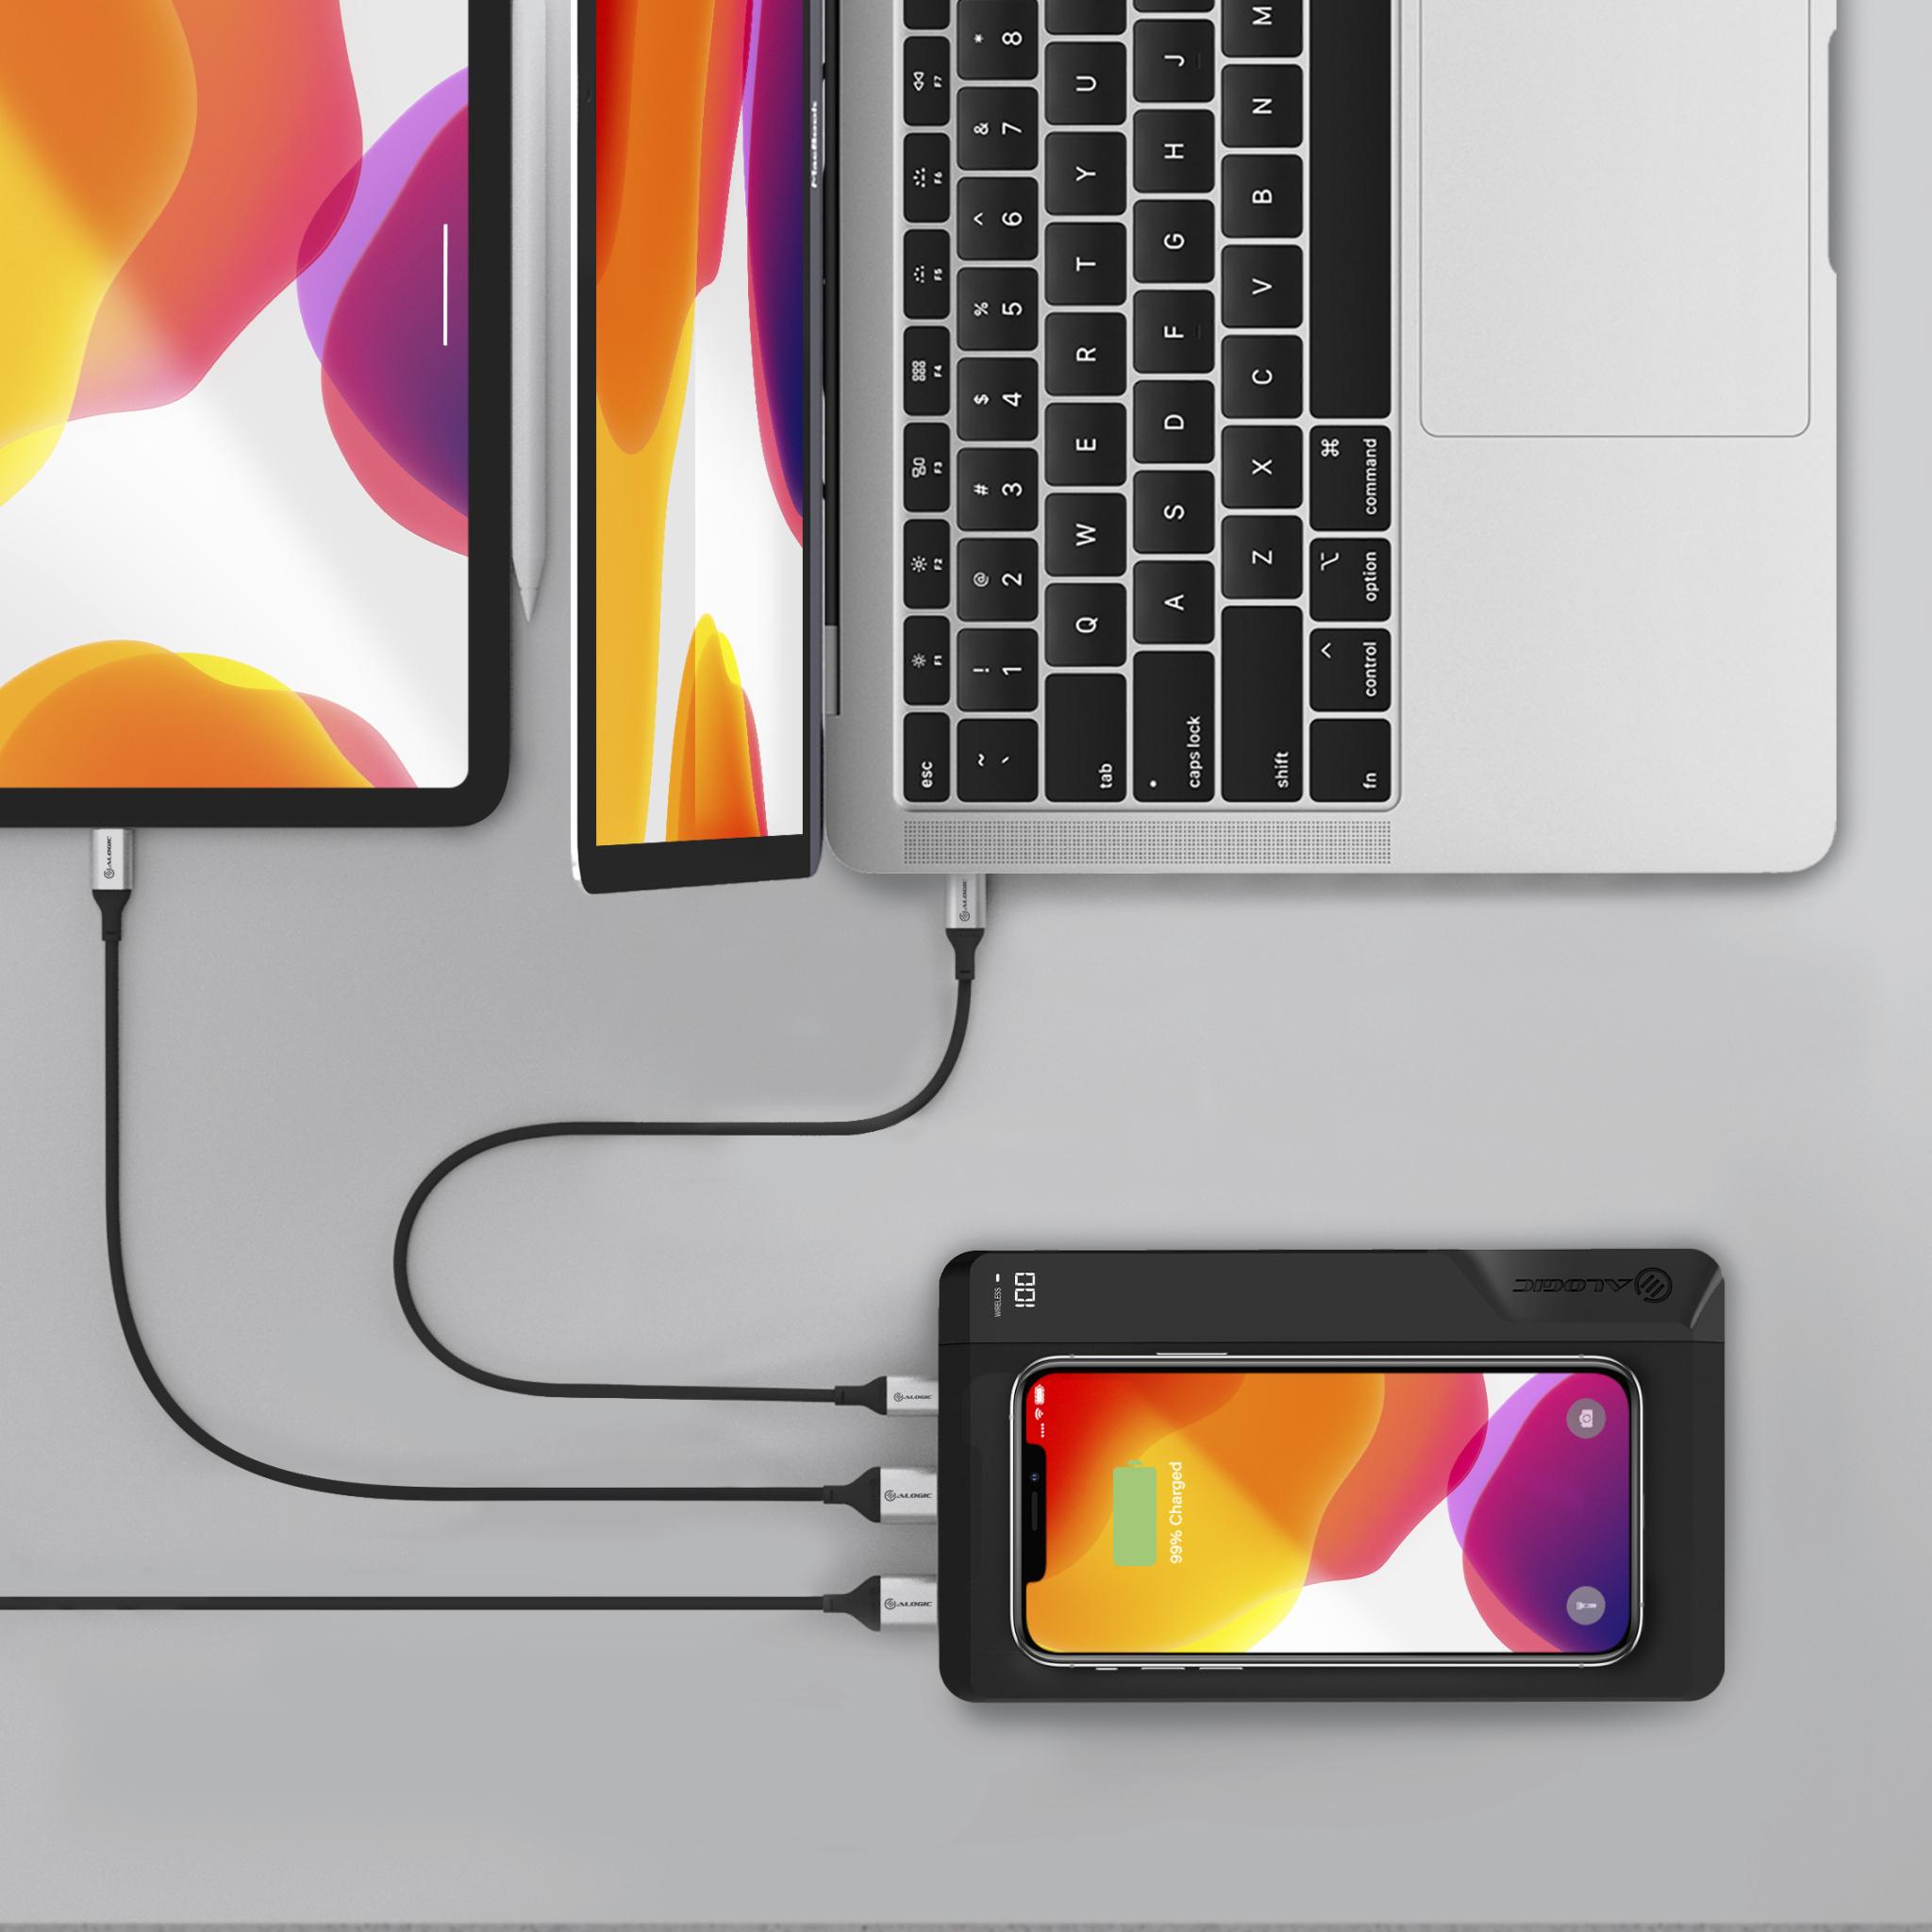 Alogic P27QC10P60-BK - Schwarz - Universal - ABS - Kautschuk - 27000 mAh - USB - 60 W